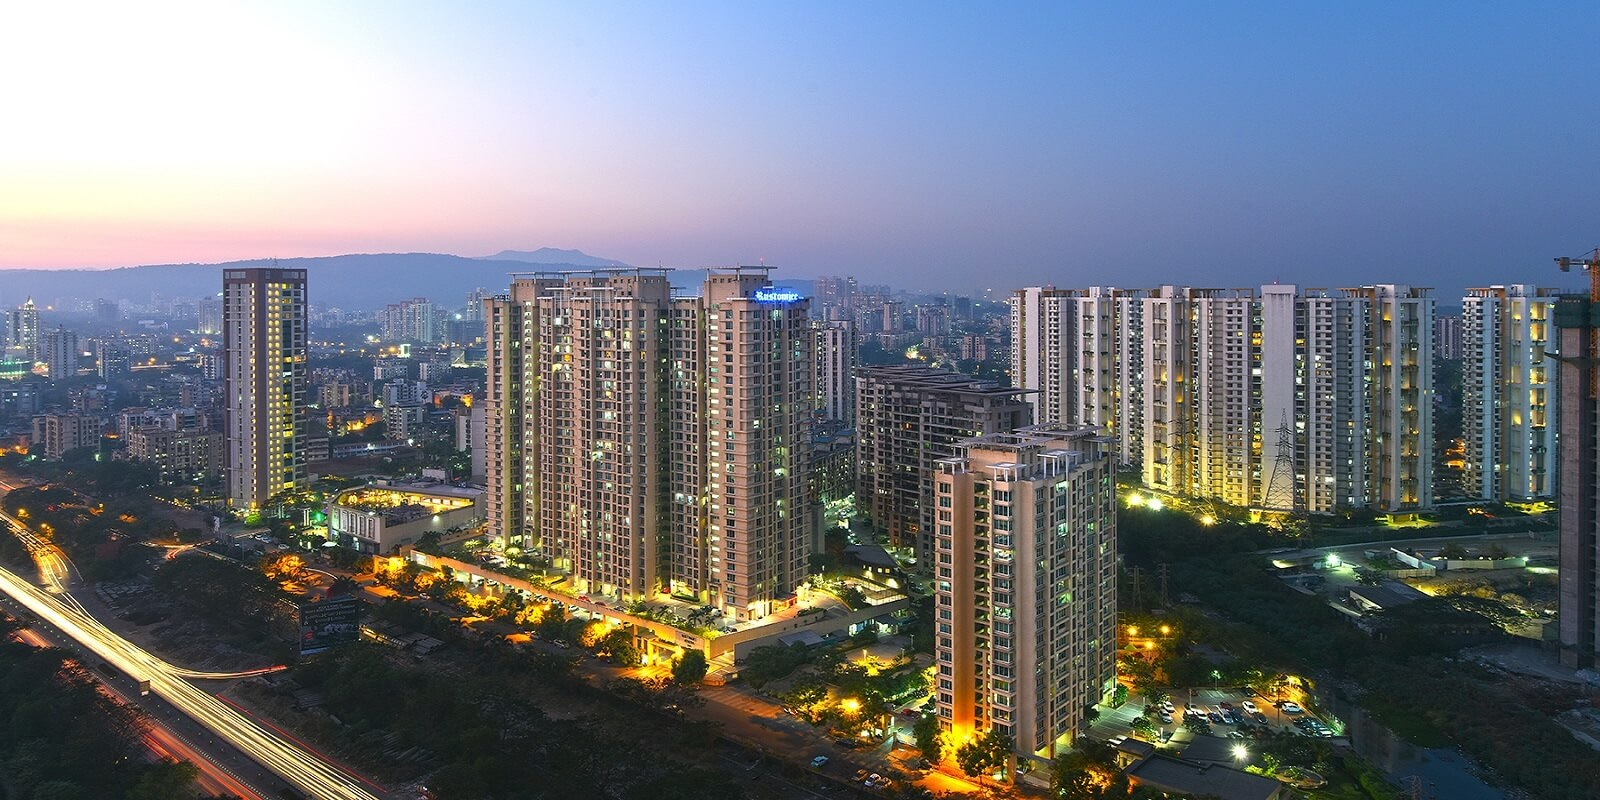 rustomjee urbania project project large image1